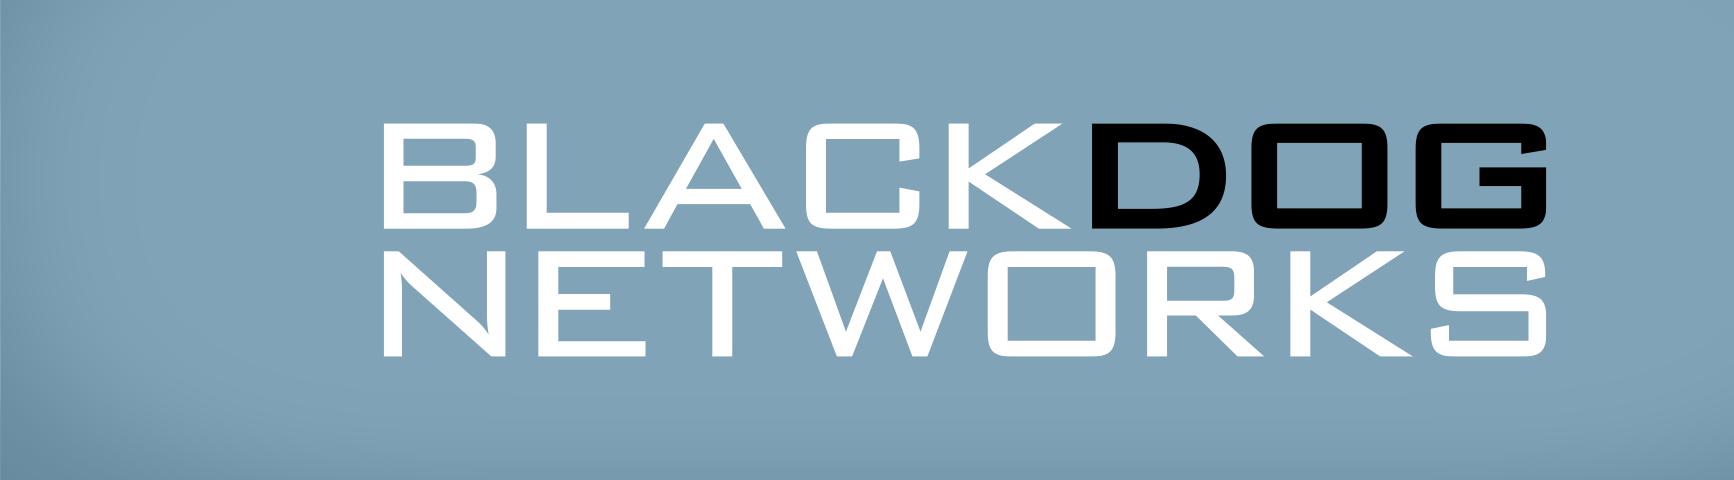 05_blackdog_lrg_thmb